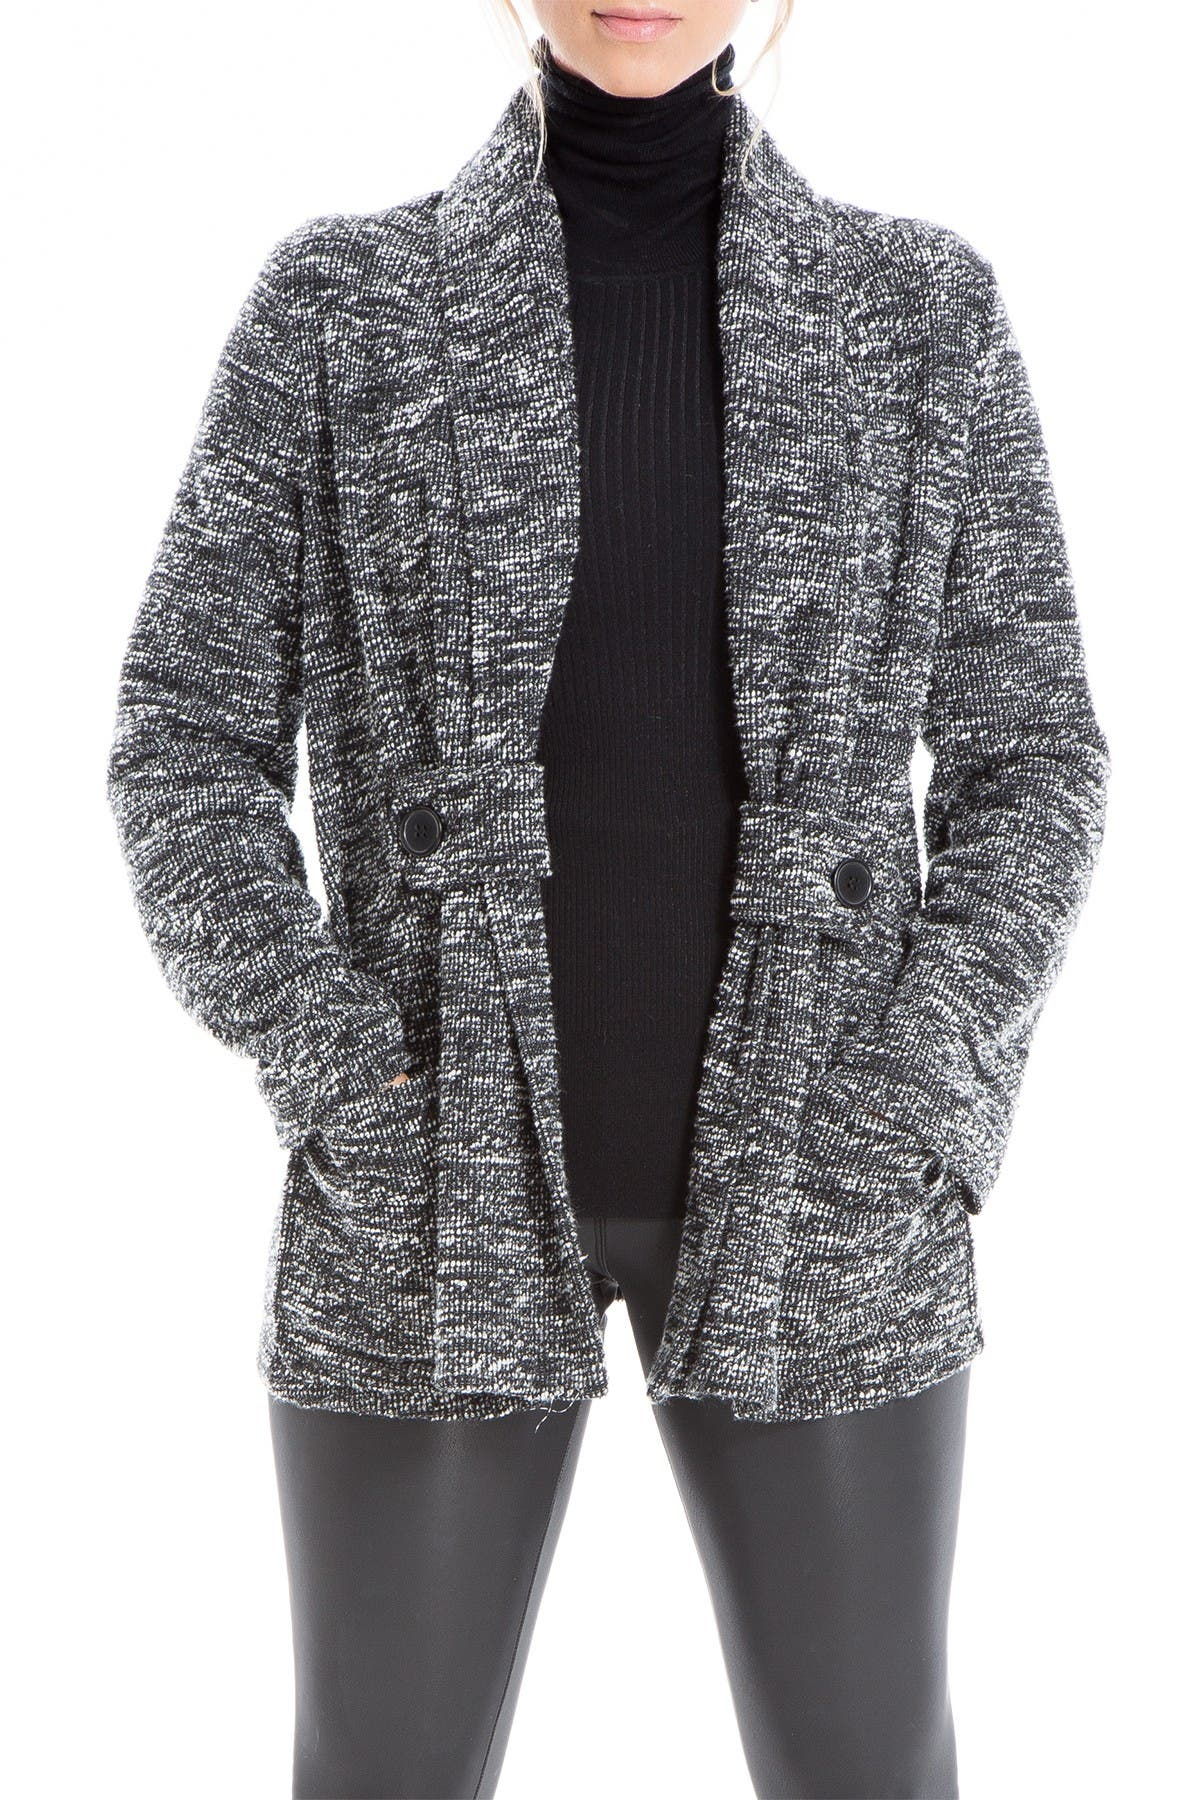 Image of Max Studio Marled Shawl Collar Button Cardigan Jacket